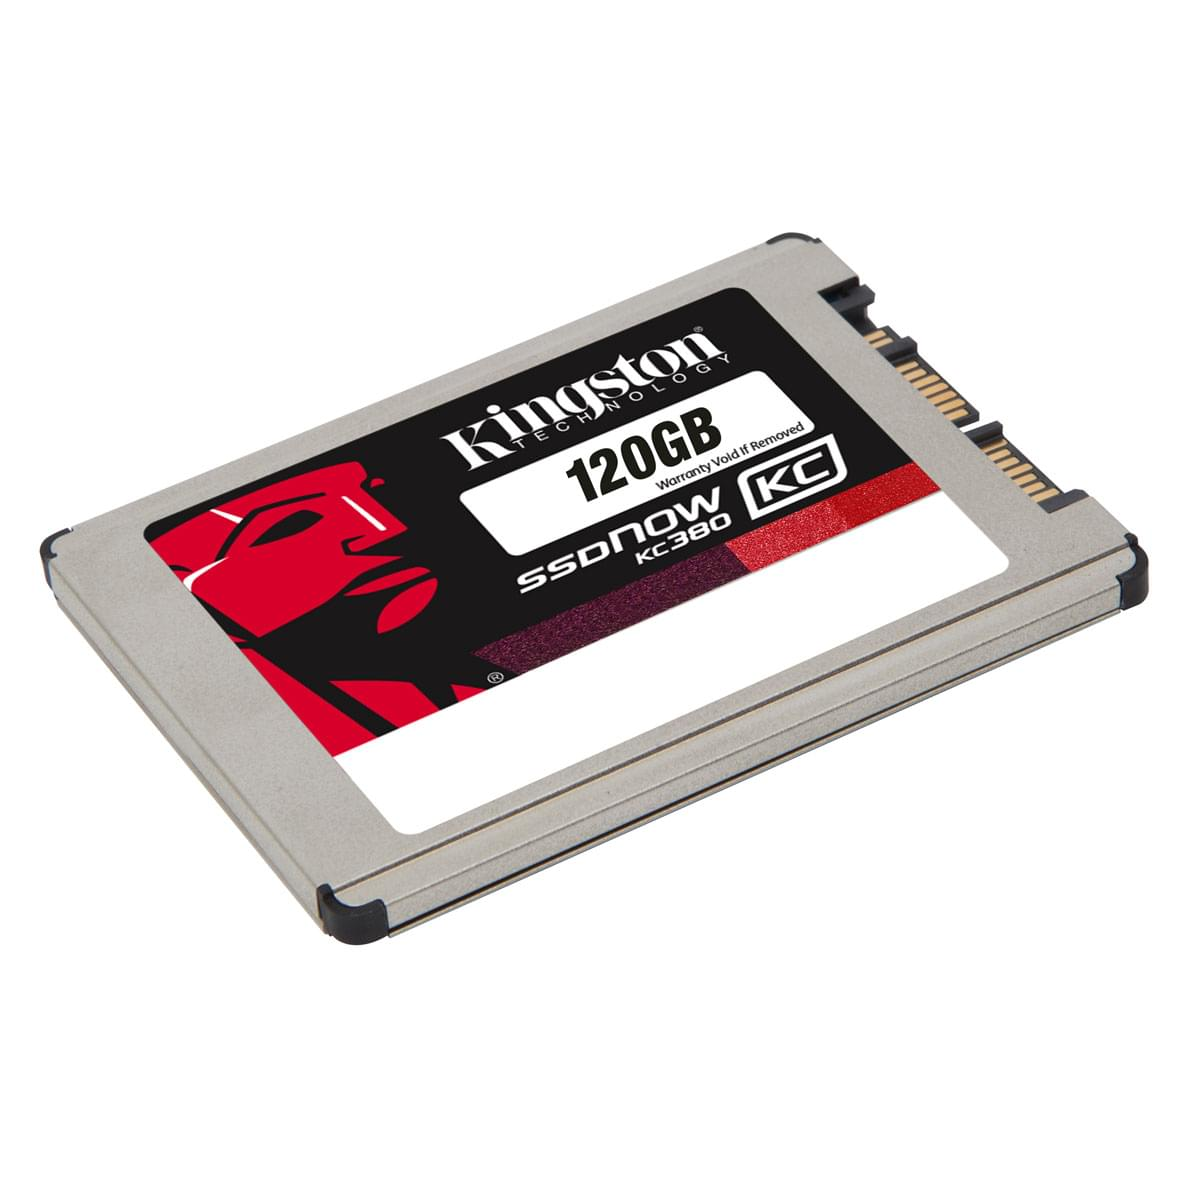 "Kingston 120Go SSD 1.8"" SSDNow KC380 uSATA SKC380S3/120G (SKC380S3/120G) - Achat / Vente Disque SSD sur Cybertek.fr - 0"